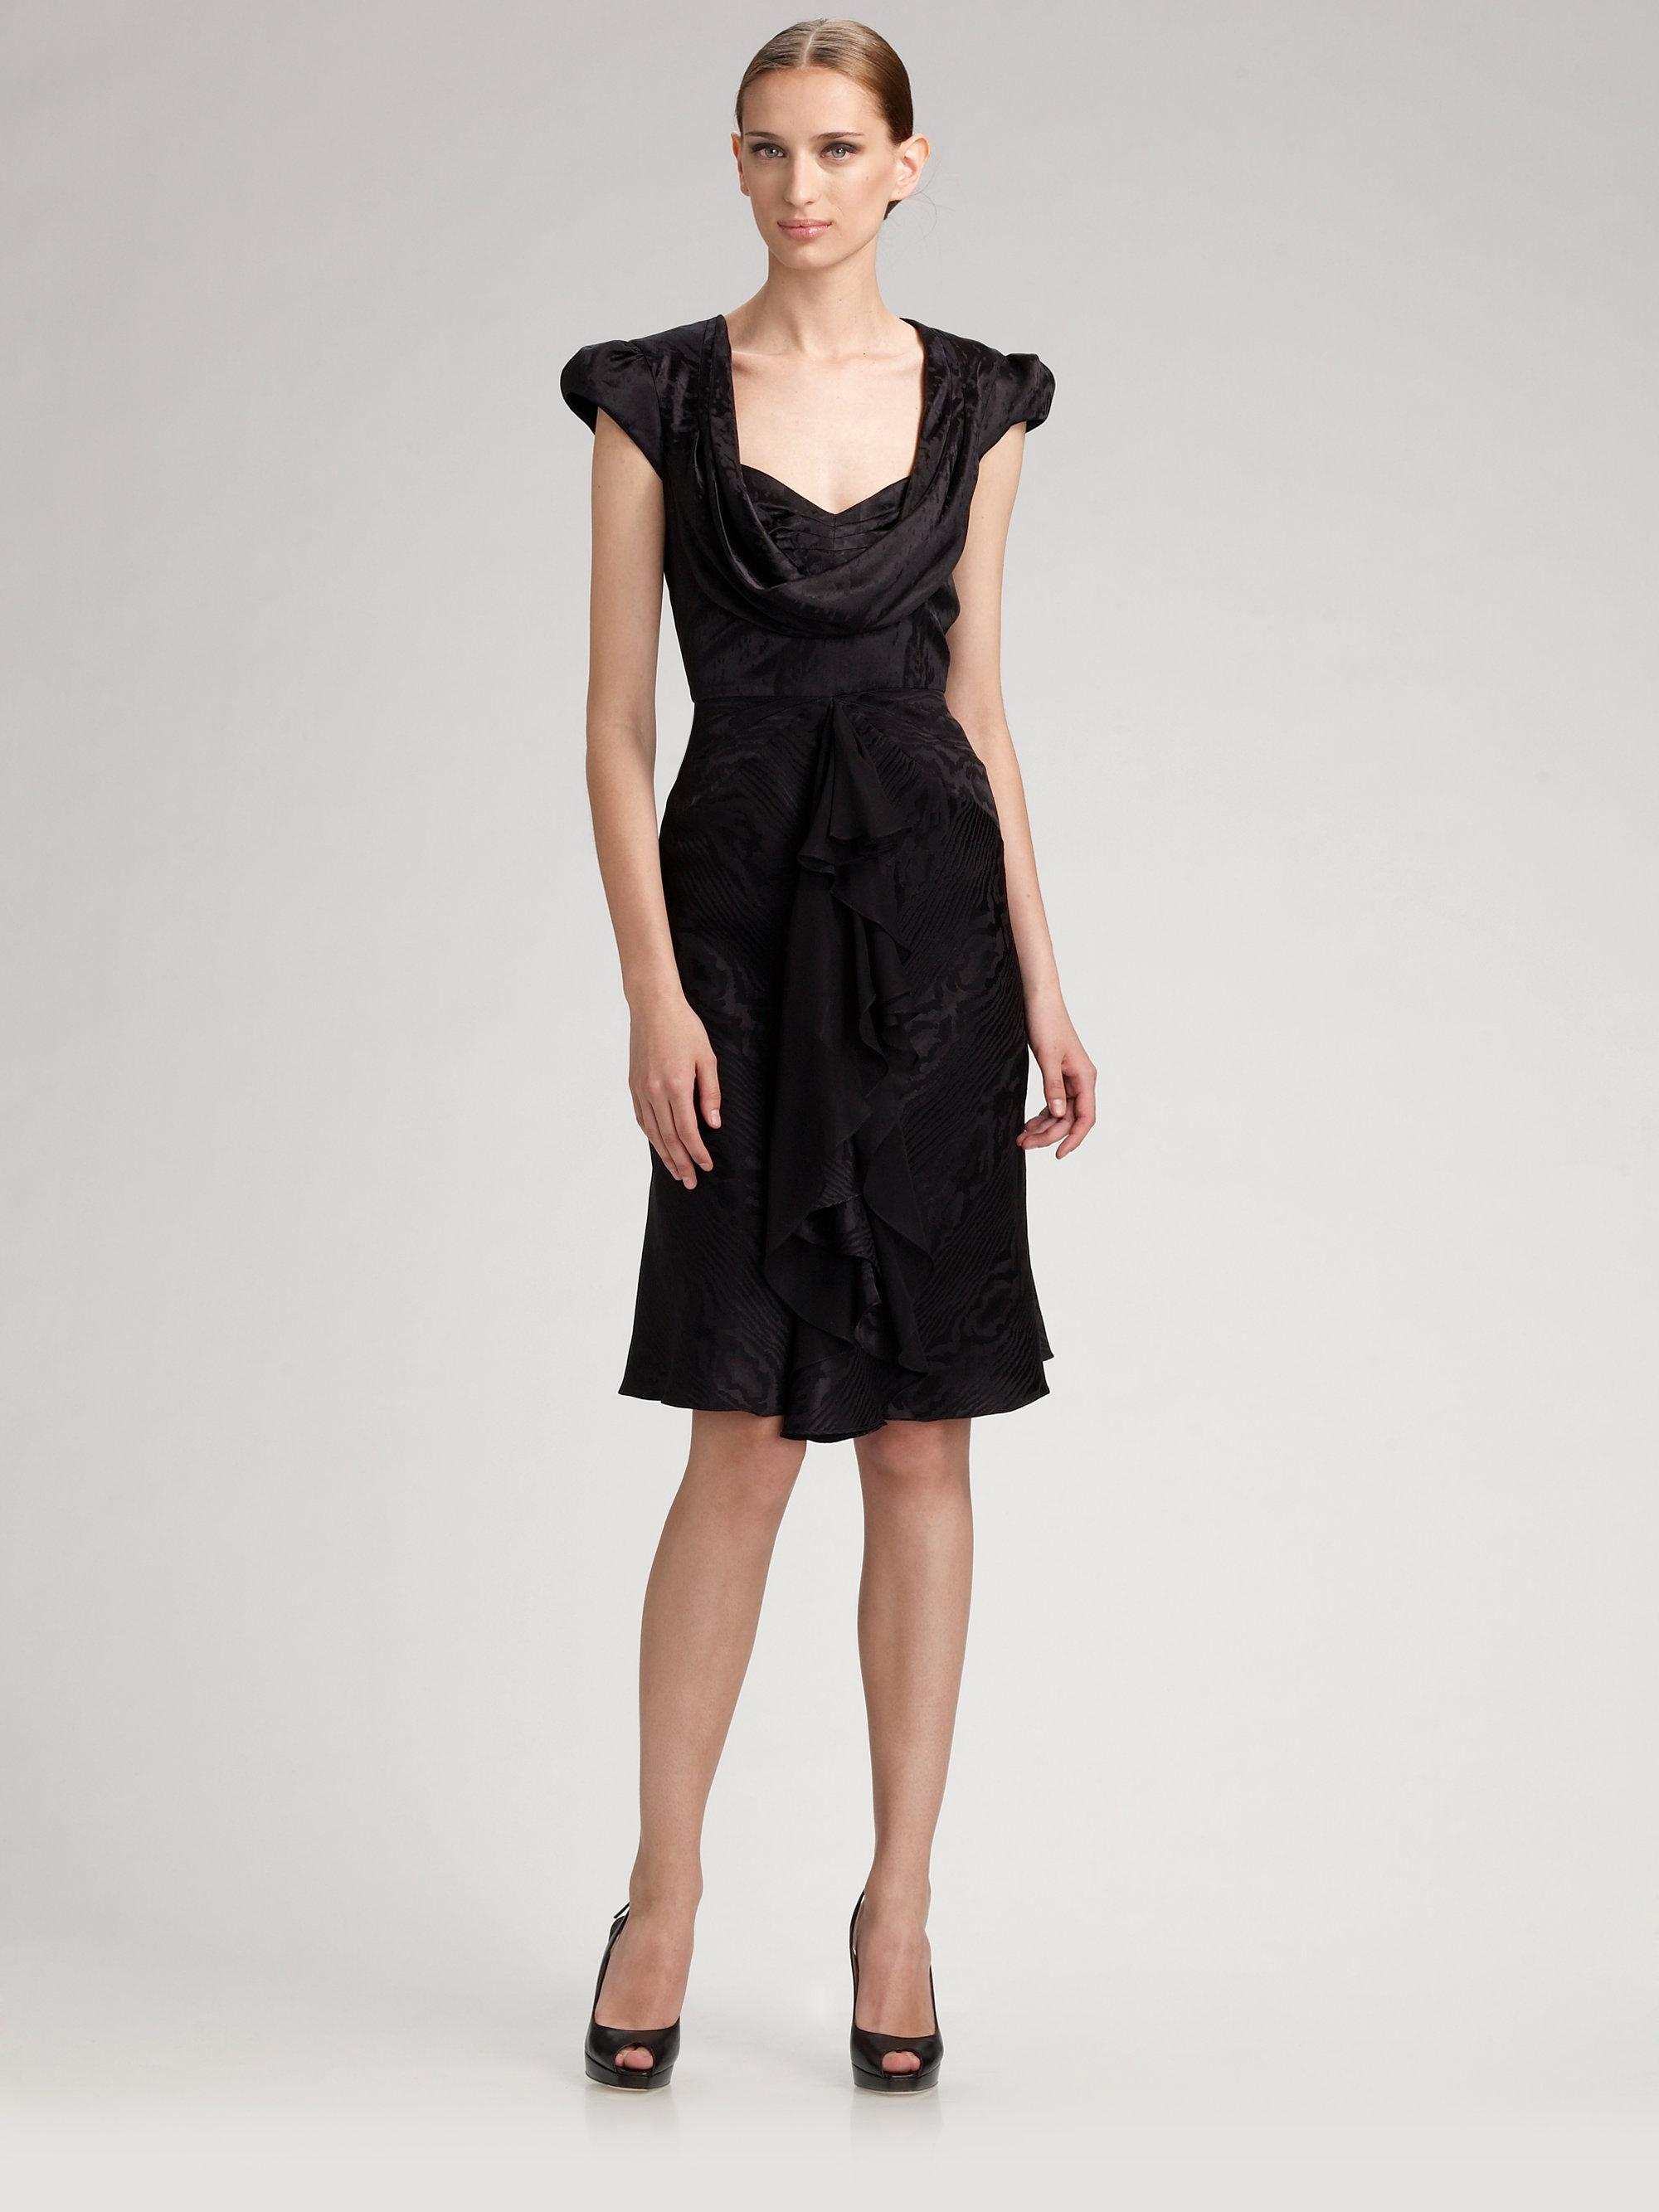 Under Sale Online Zac Posen KnitTrimmed Evening Dress Clearance ...